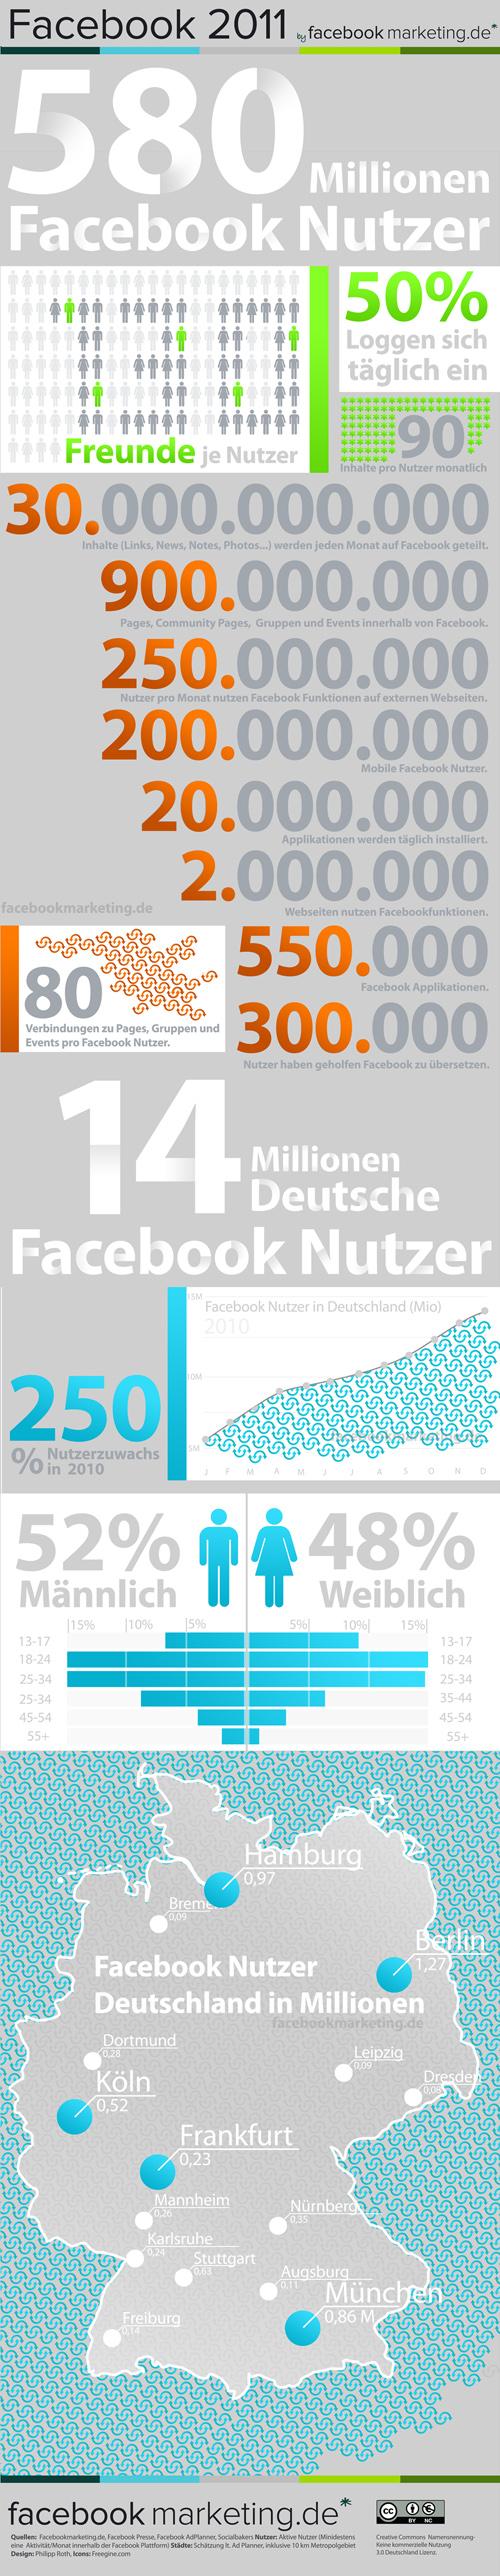 Infografik: Facebook Zahlen & Fakten 2011